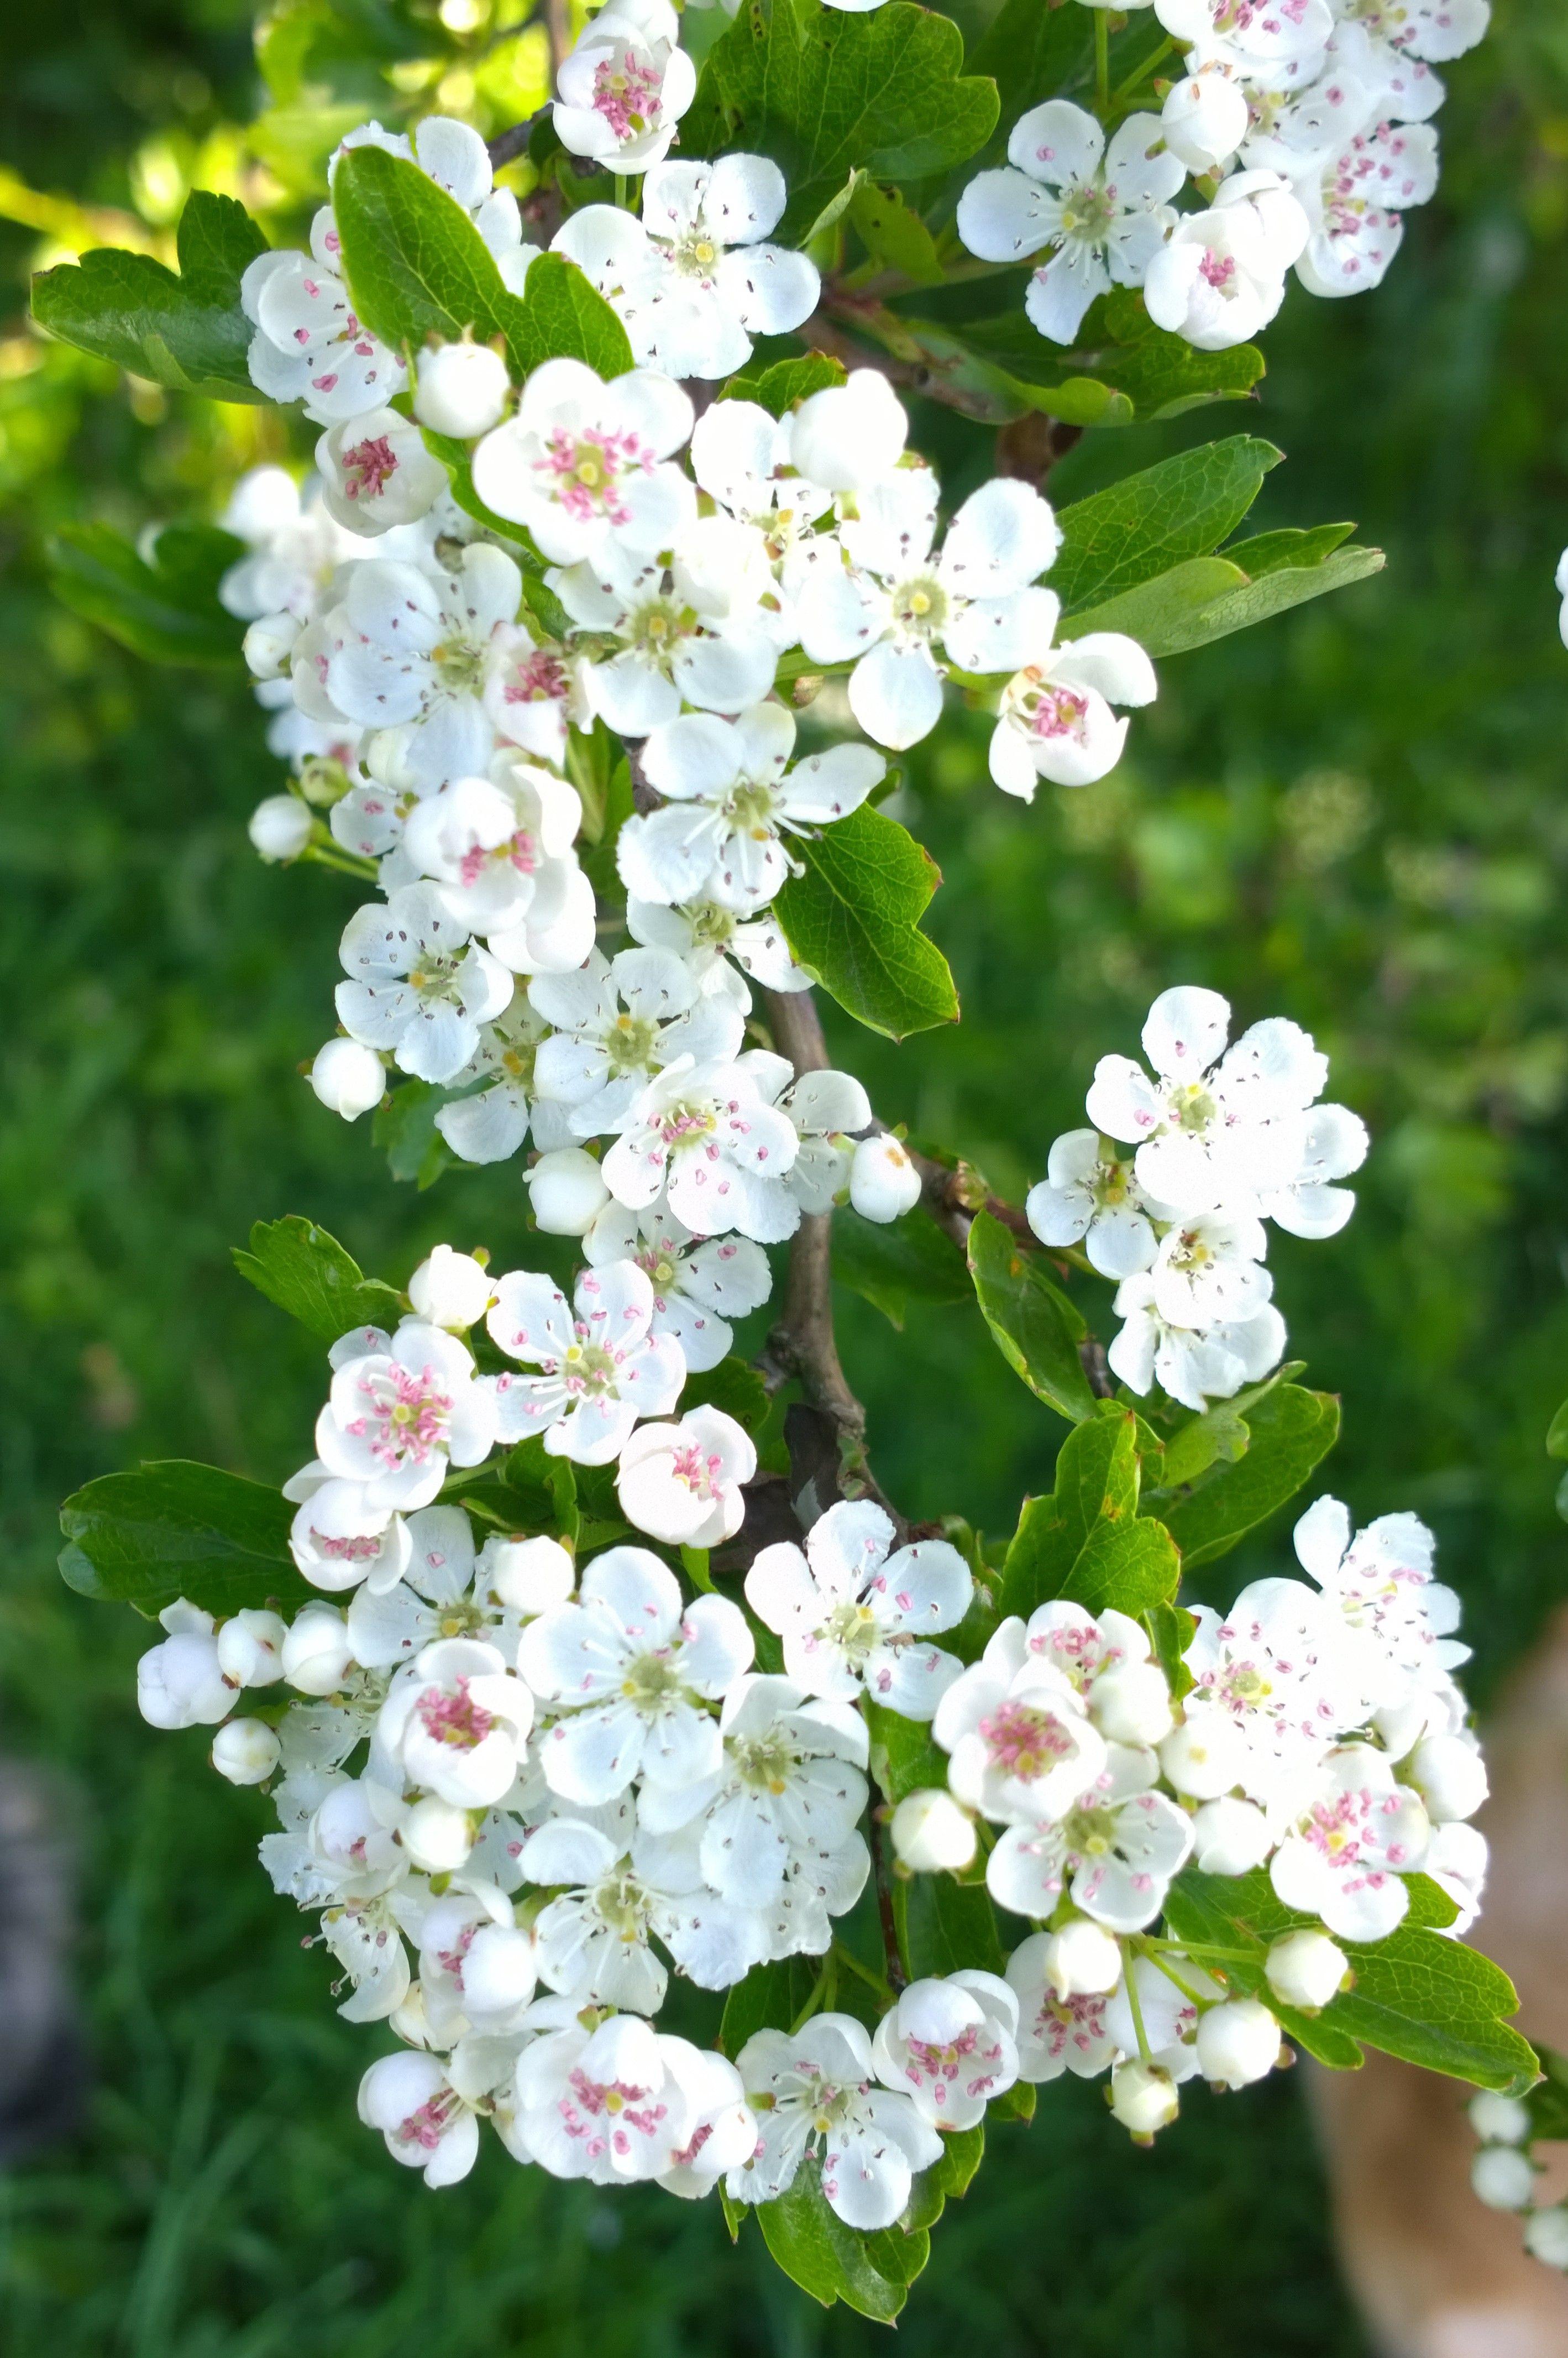 Morning spring small white flowers aylestone lane wigston morning spring small white flowers aylestone lane wigston leicestershire uk 2018 by mightylinksfo